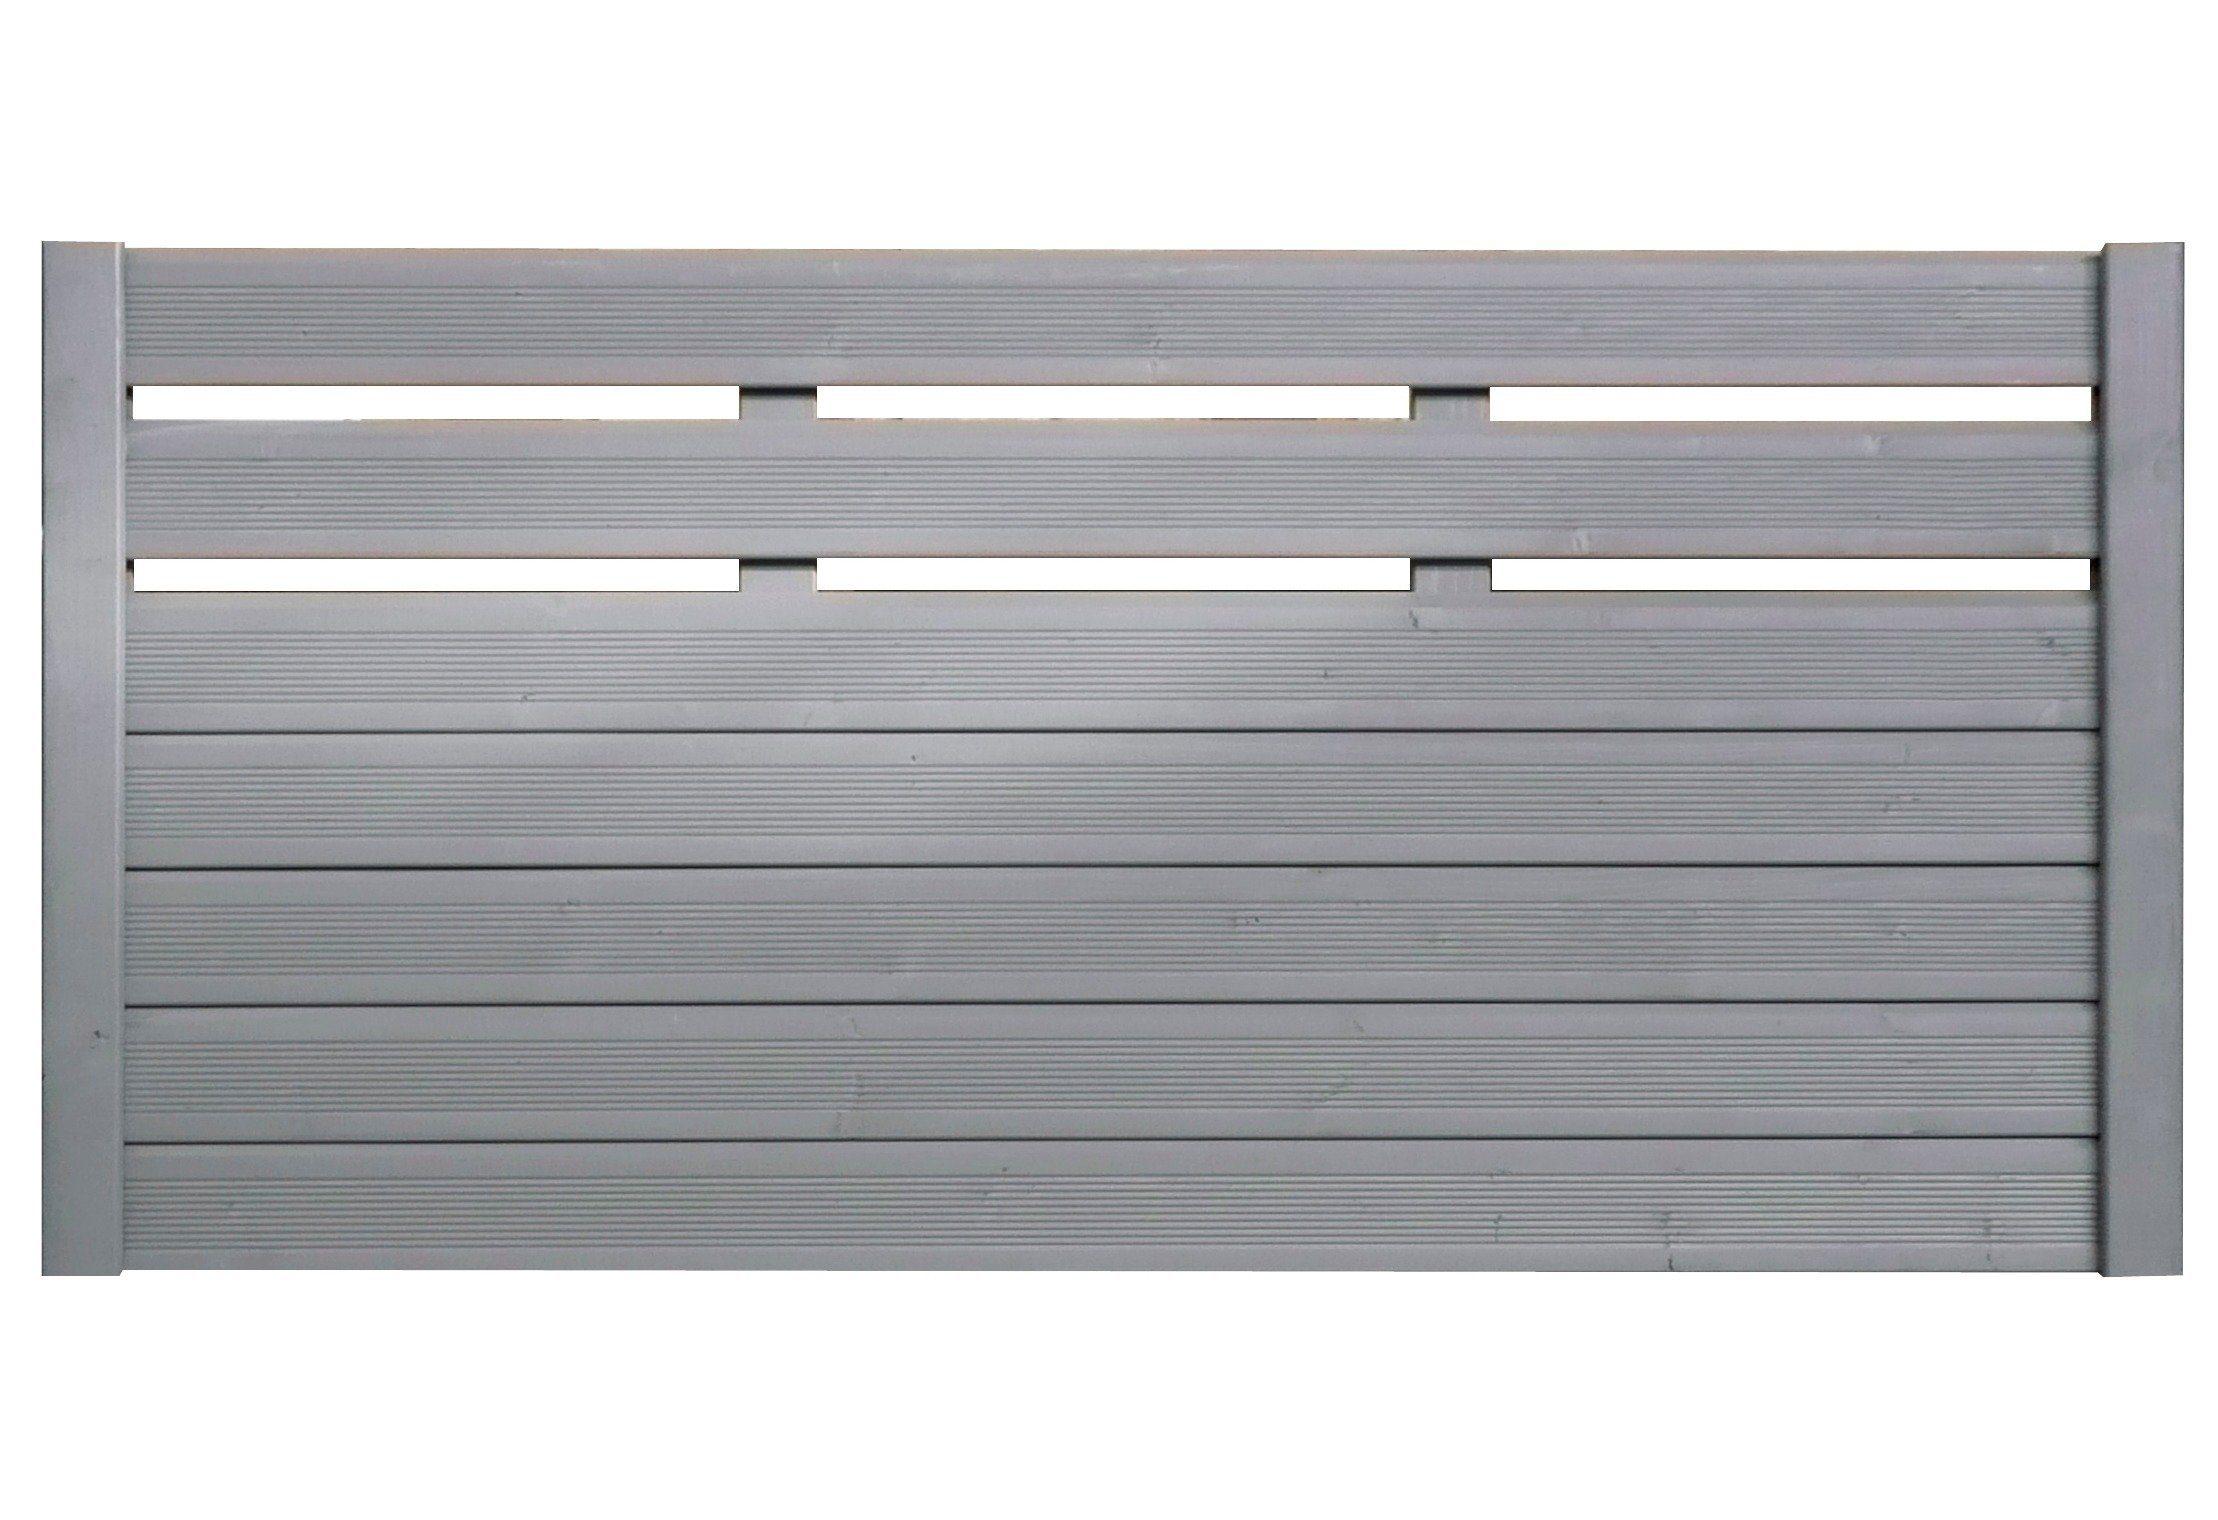 Bm Massivholz Sichtschutz Zaunelement silbergrau »EA5Y-F1X 4« (Höhe 90 cm)